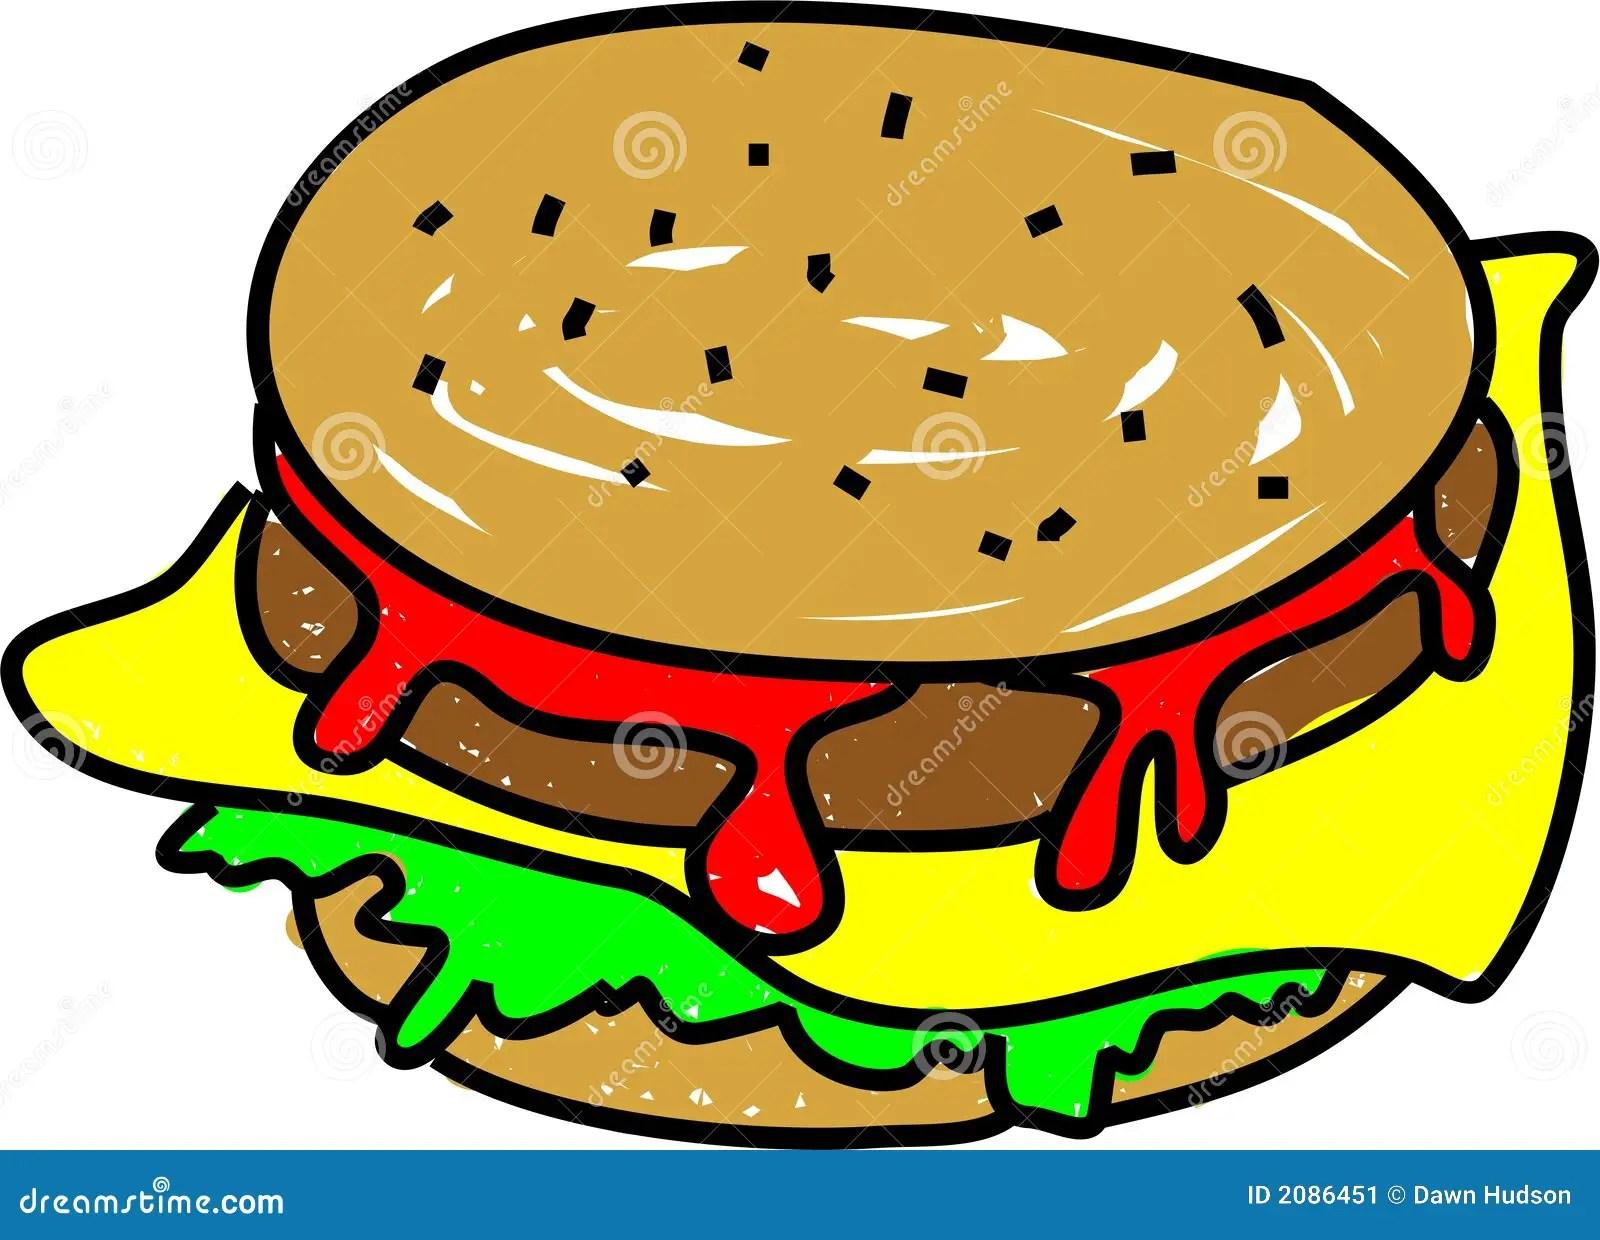 Cheeseburger Stock Vector Illustration Of Illustration